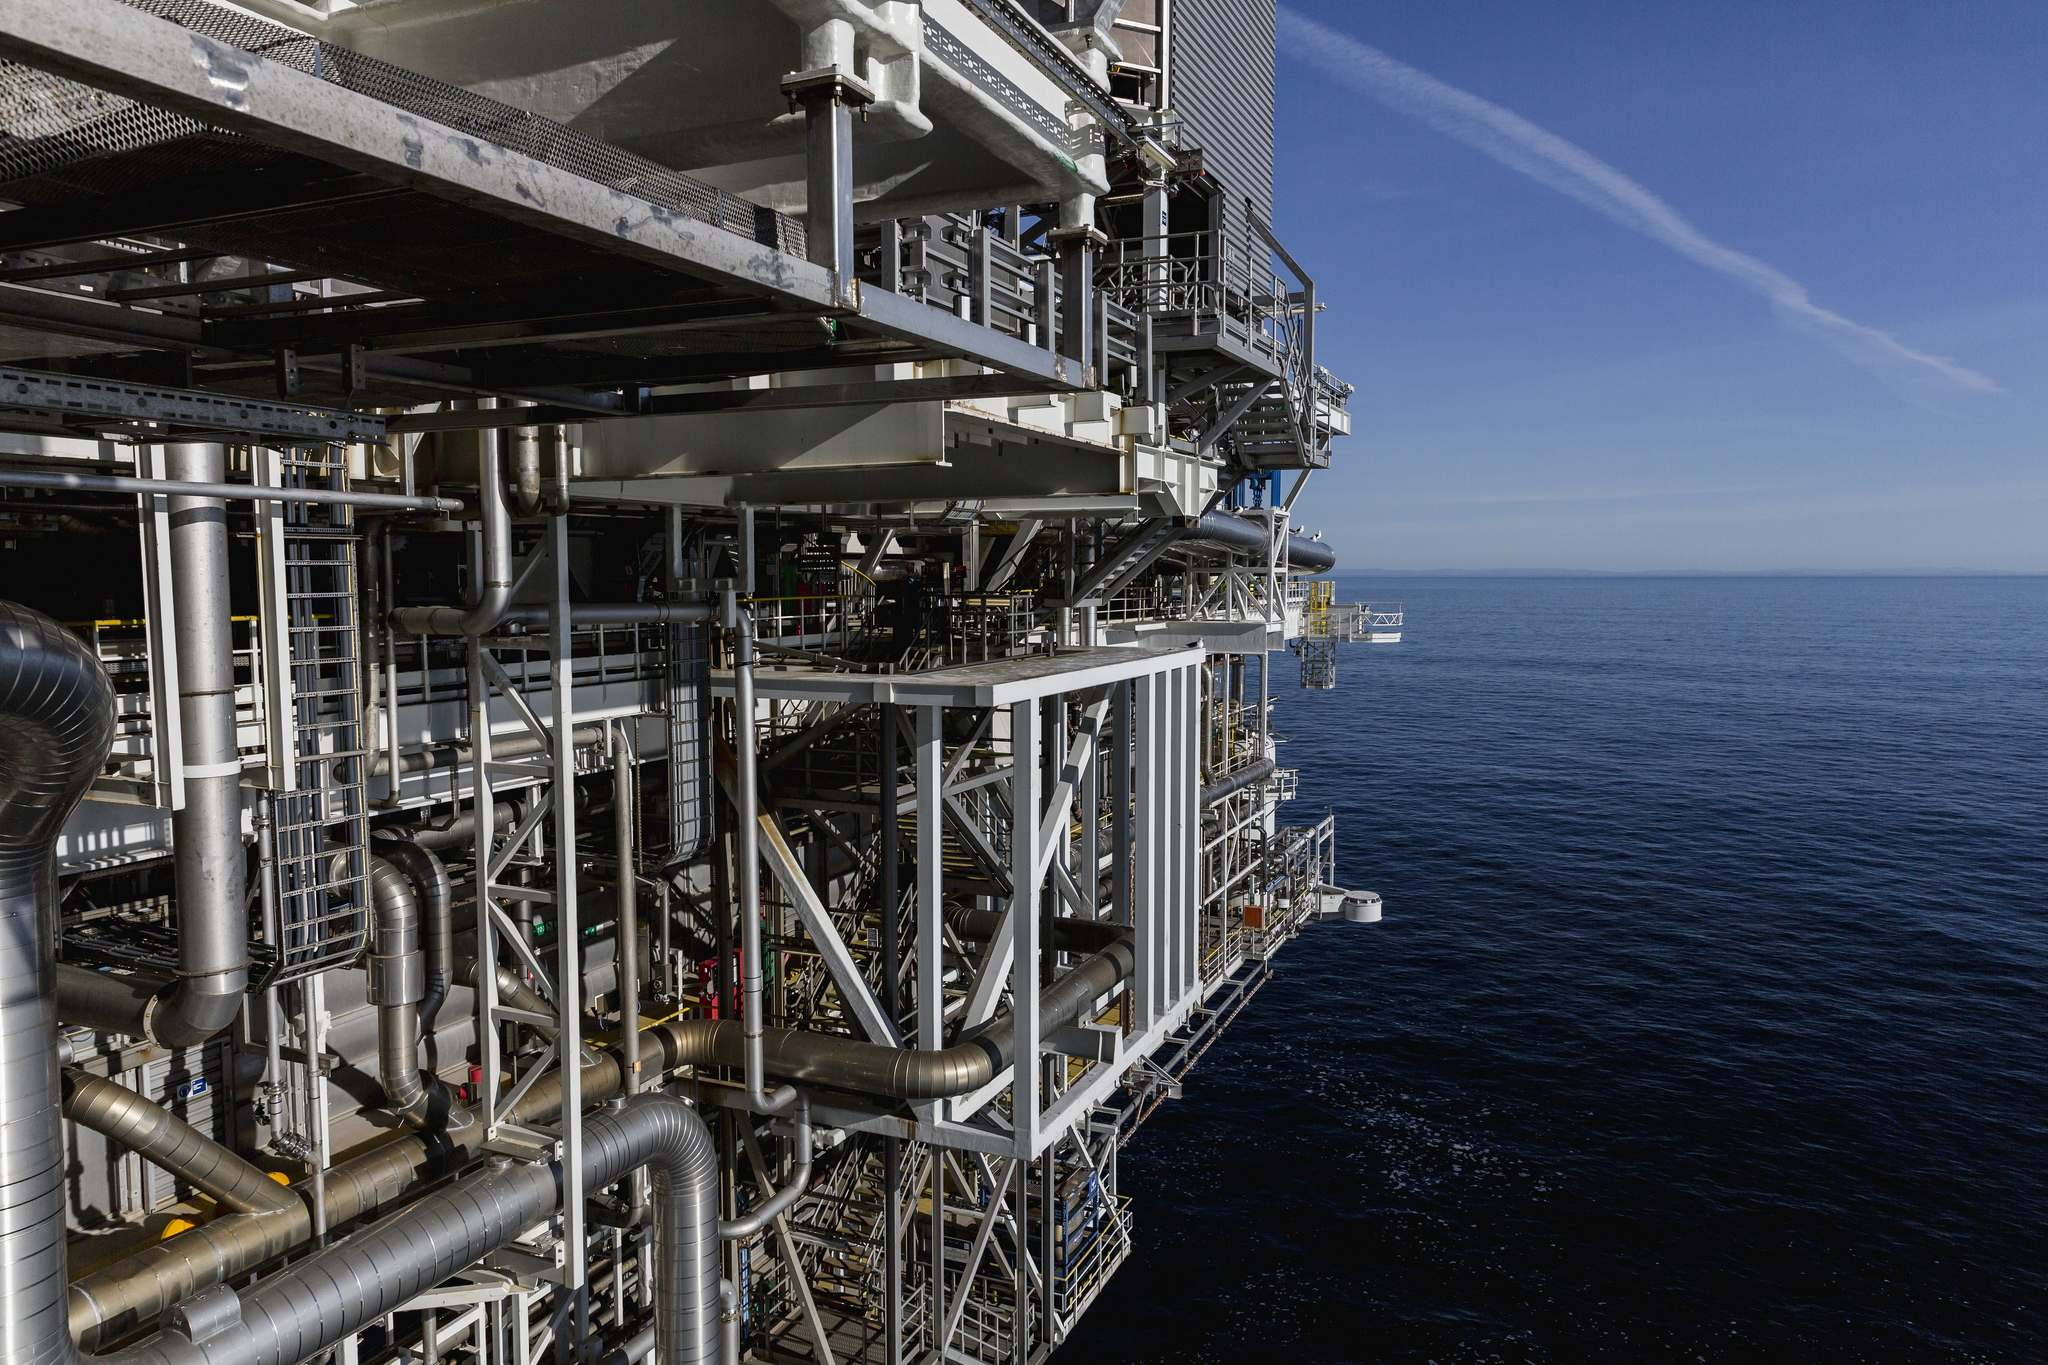 troll a3 Megastructure   Troll A Gas Platform, Norway